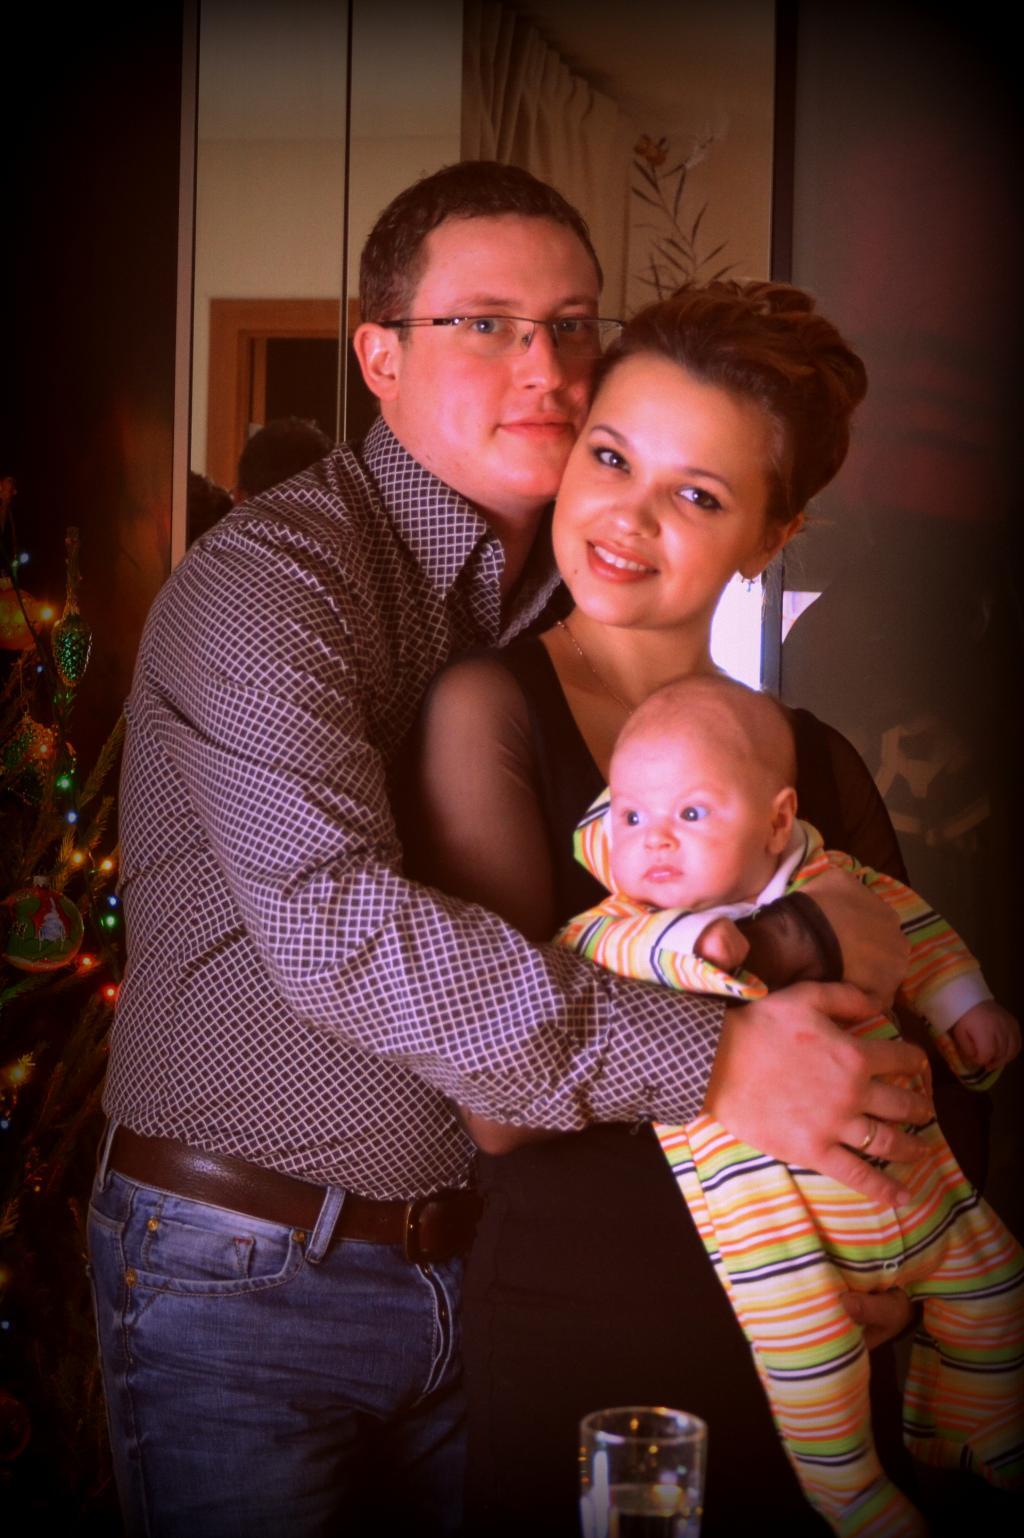 Мама папа я - счастливая семья. Мама, папа, я - счастливая семья!